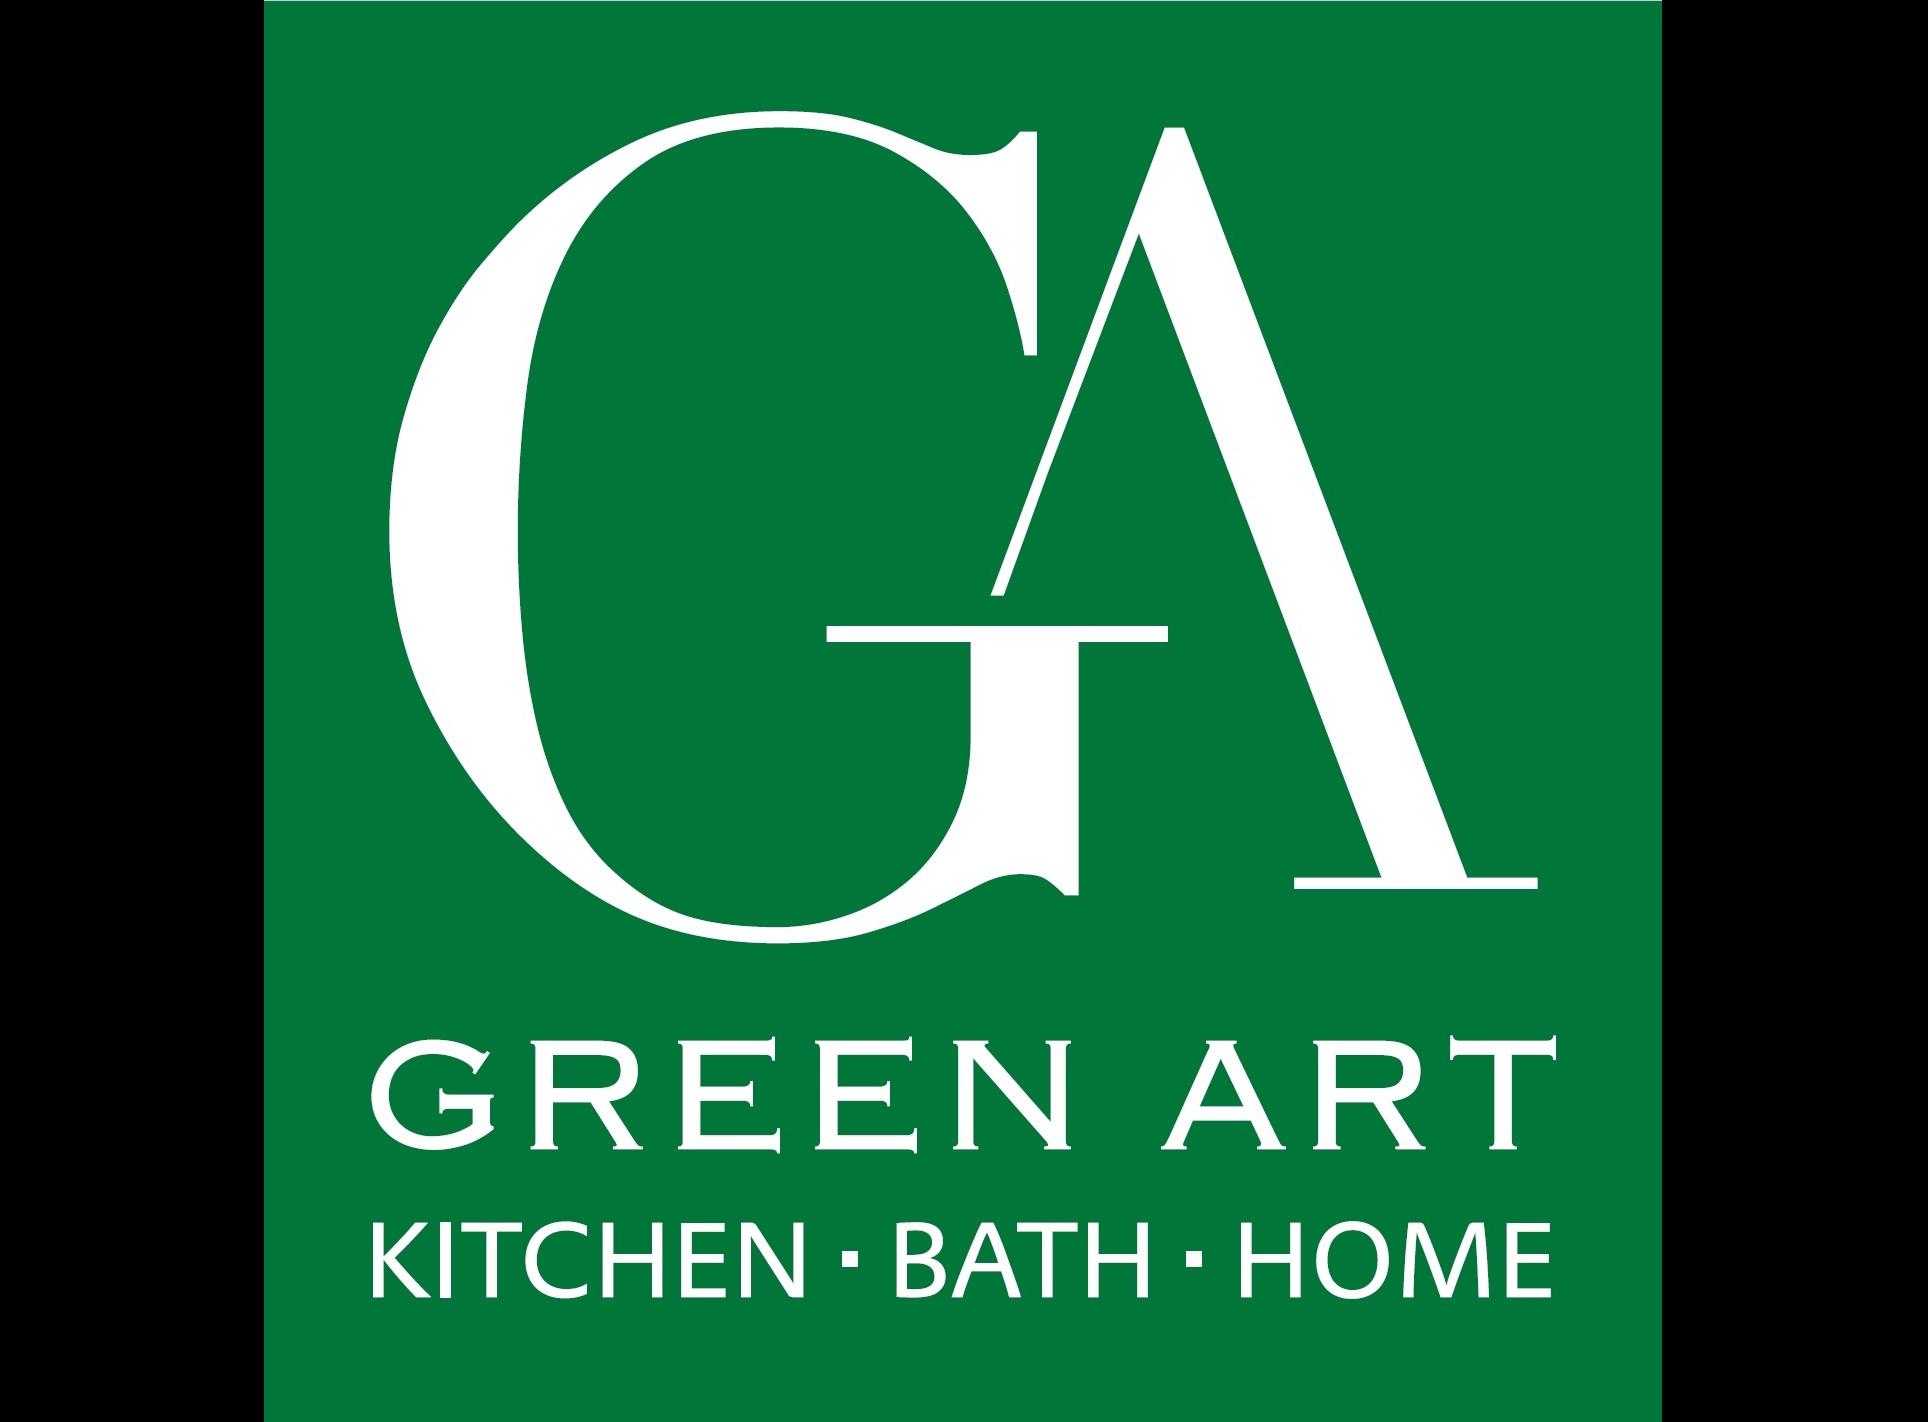 Logo for Green Art Plumbing Supply